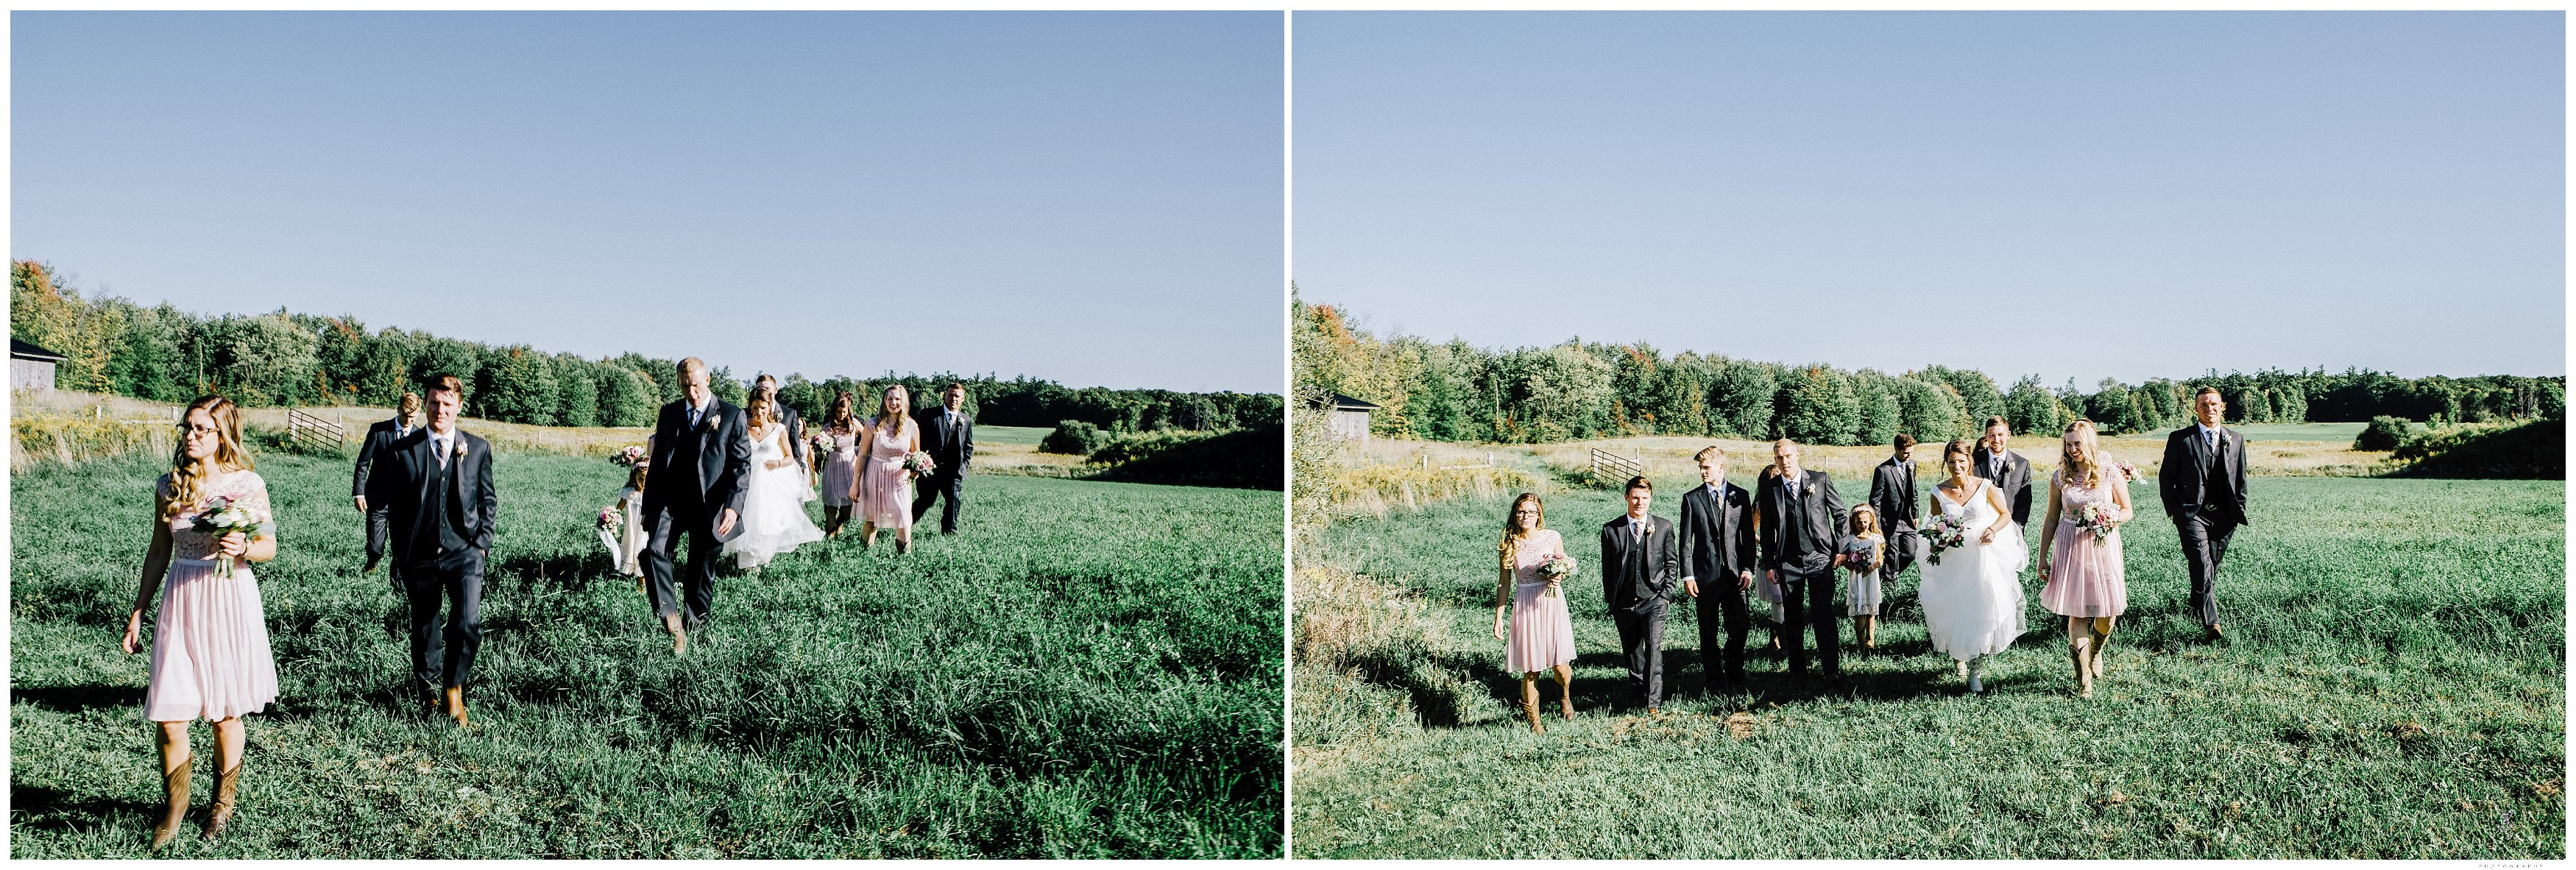 Ontario Barn Wedding_2187.jpg